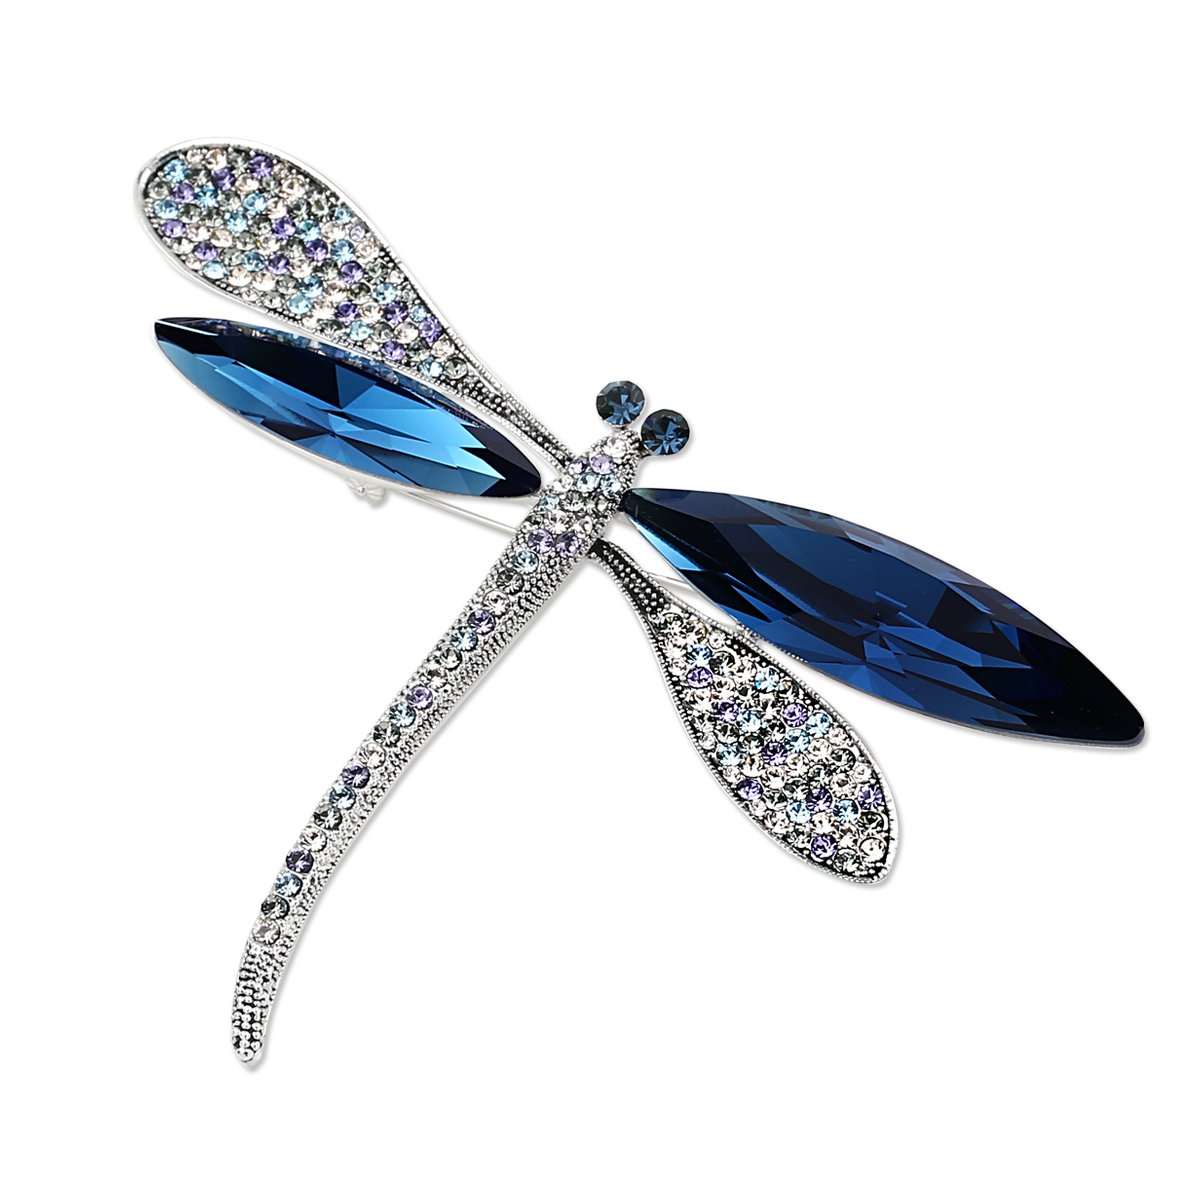 DONGZHOU Women's Rhinestone Crystal Luxurious Dragonfly Aniaml Brooch Pin Broach Fashion Jewelry